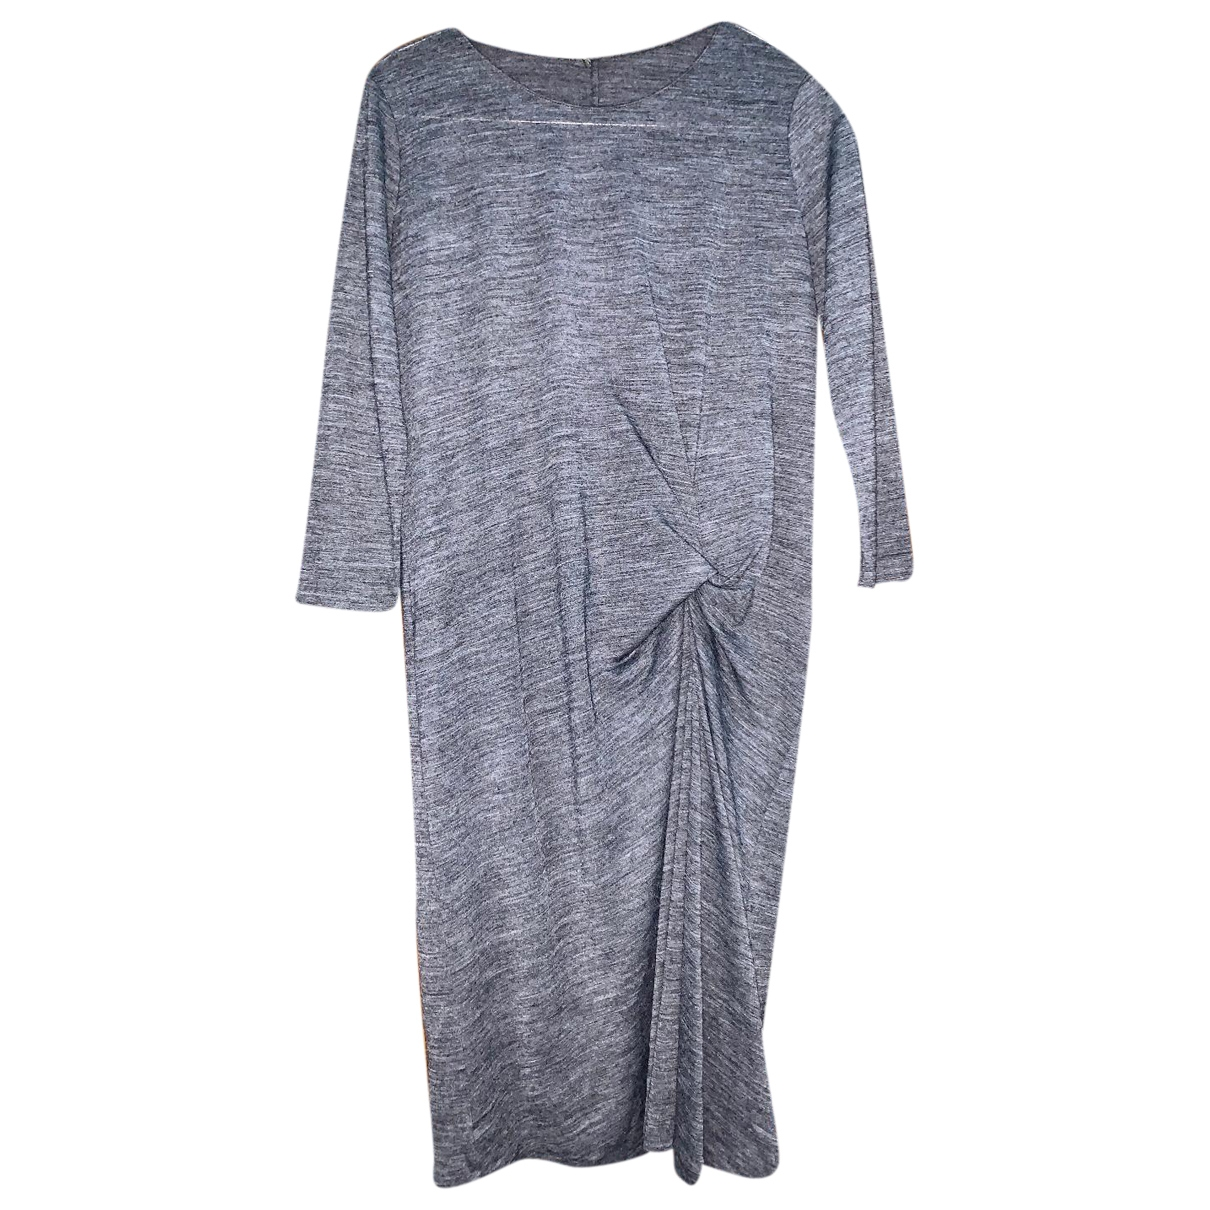 Massimo Dutti \N Grey dress for Women S International